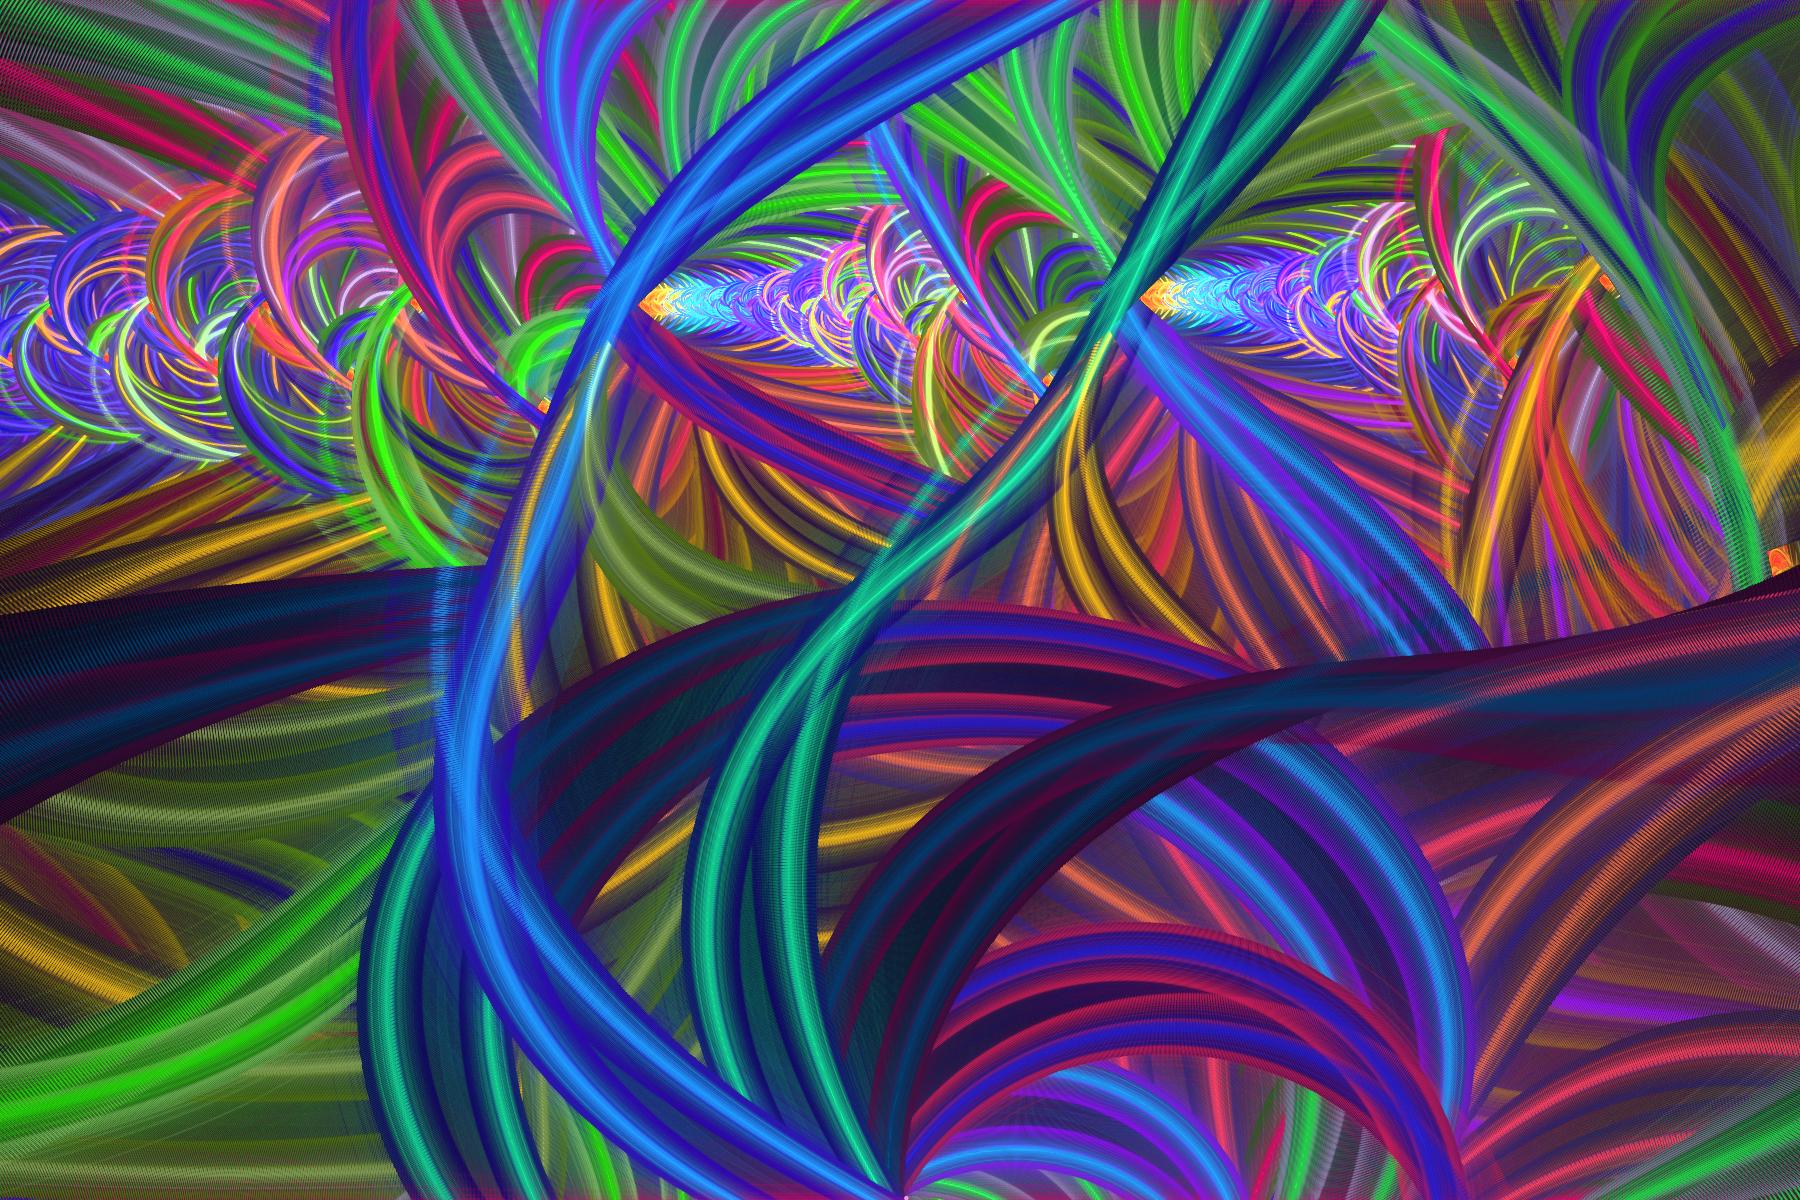 Meridia by 0bsidianFire